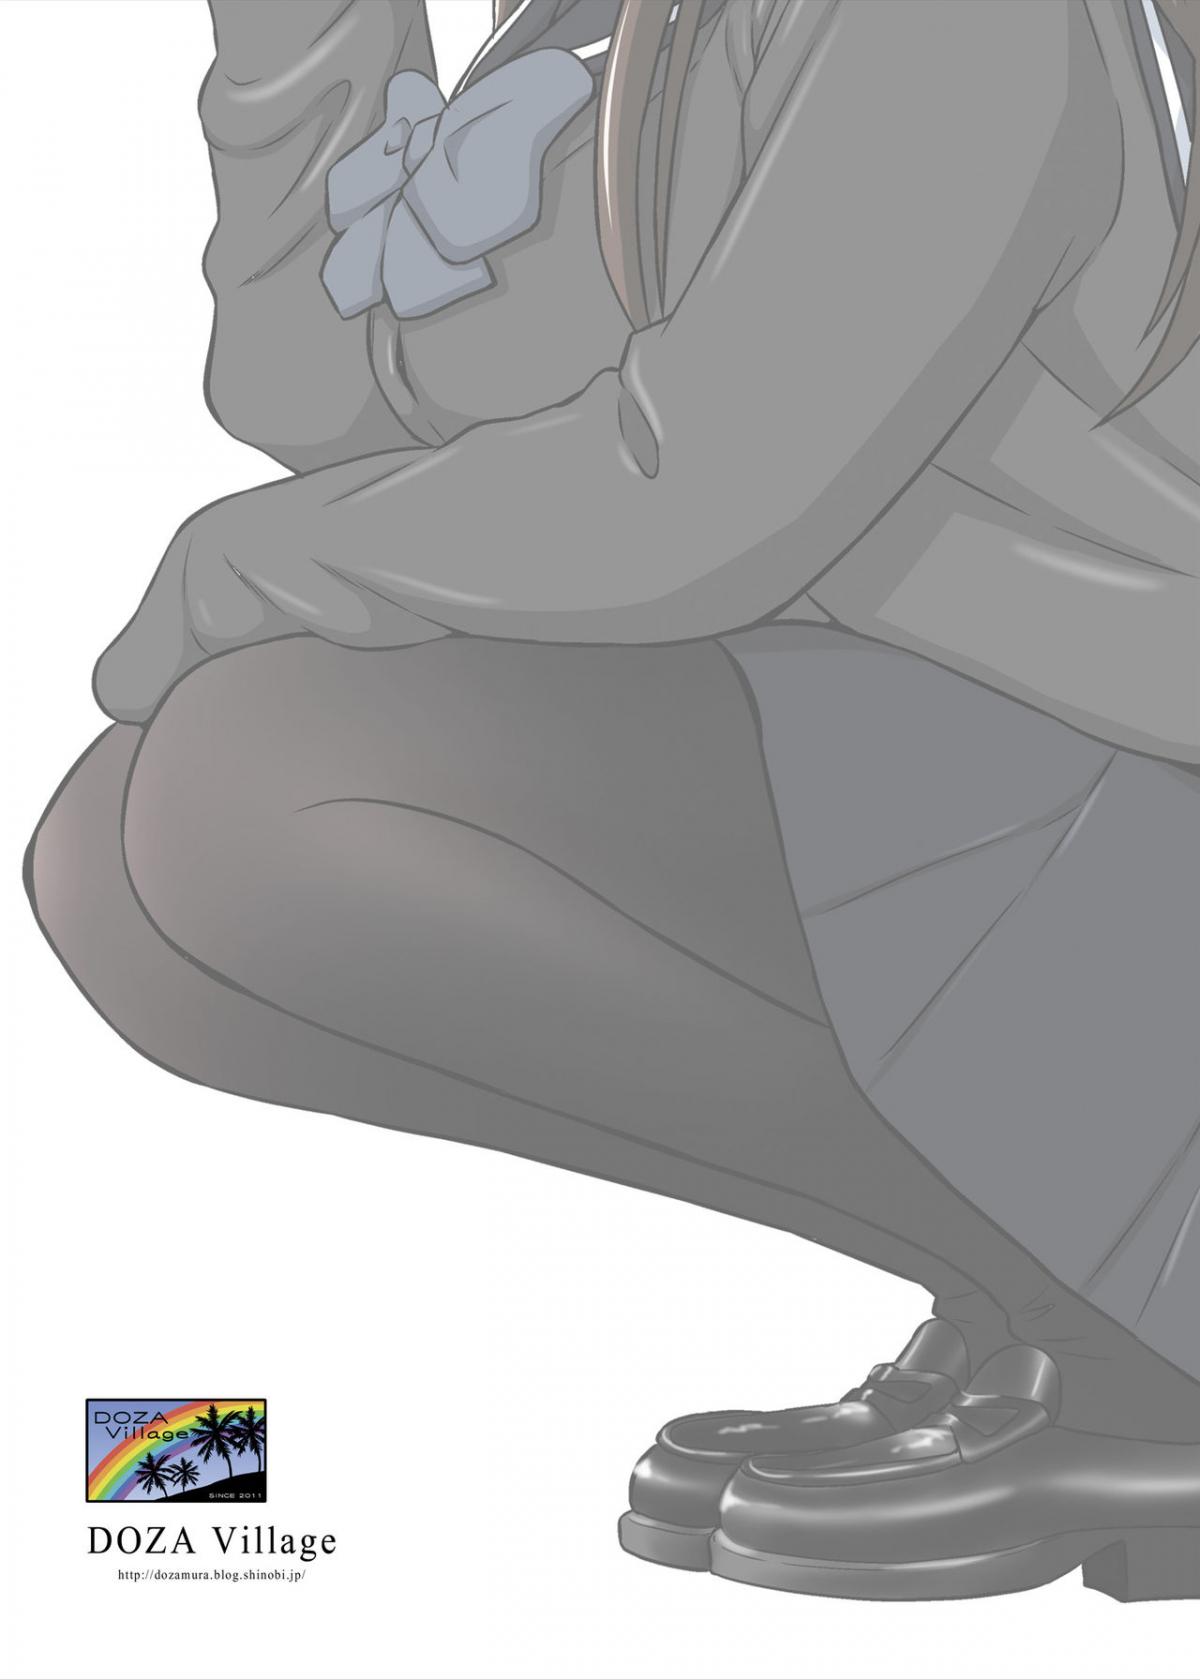 HentaiVN.net - Ảnh 31 - Netori Ojisan ~Seijun-ha Joshikousei Tobe Miho Hen~ - Netorare Old Man ~Story Of A School Girls Purity~; 寢取りオジサン~清純派女子◯生 戸部美帆編~ - Chap 2 [End]